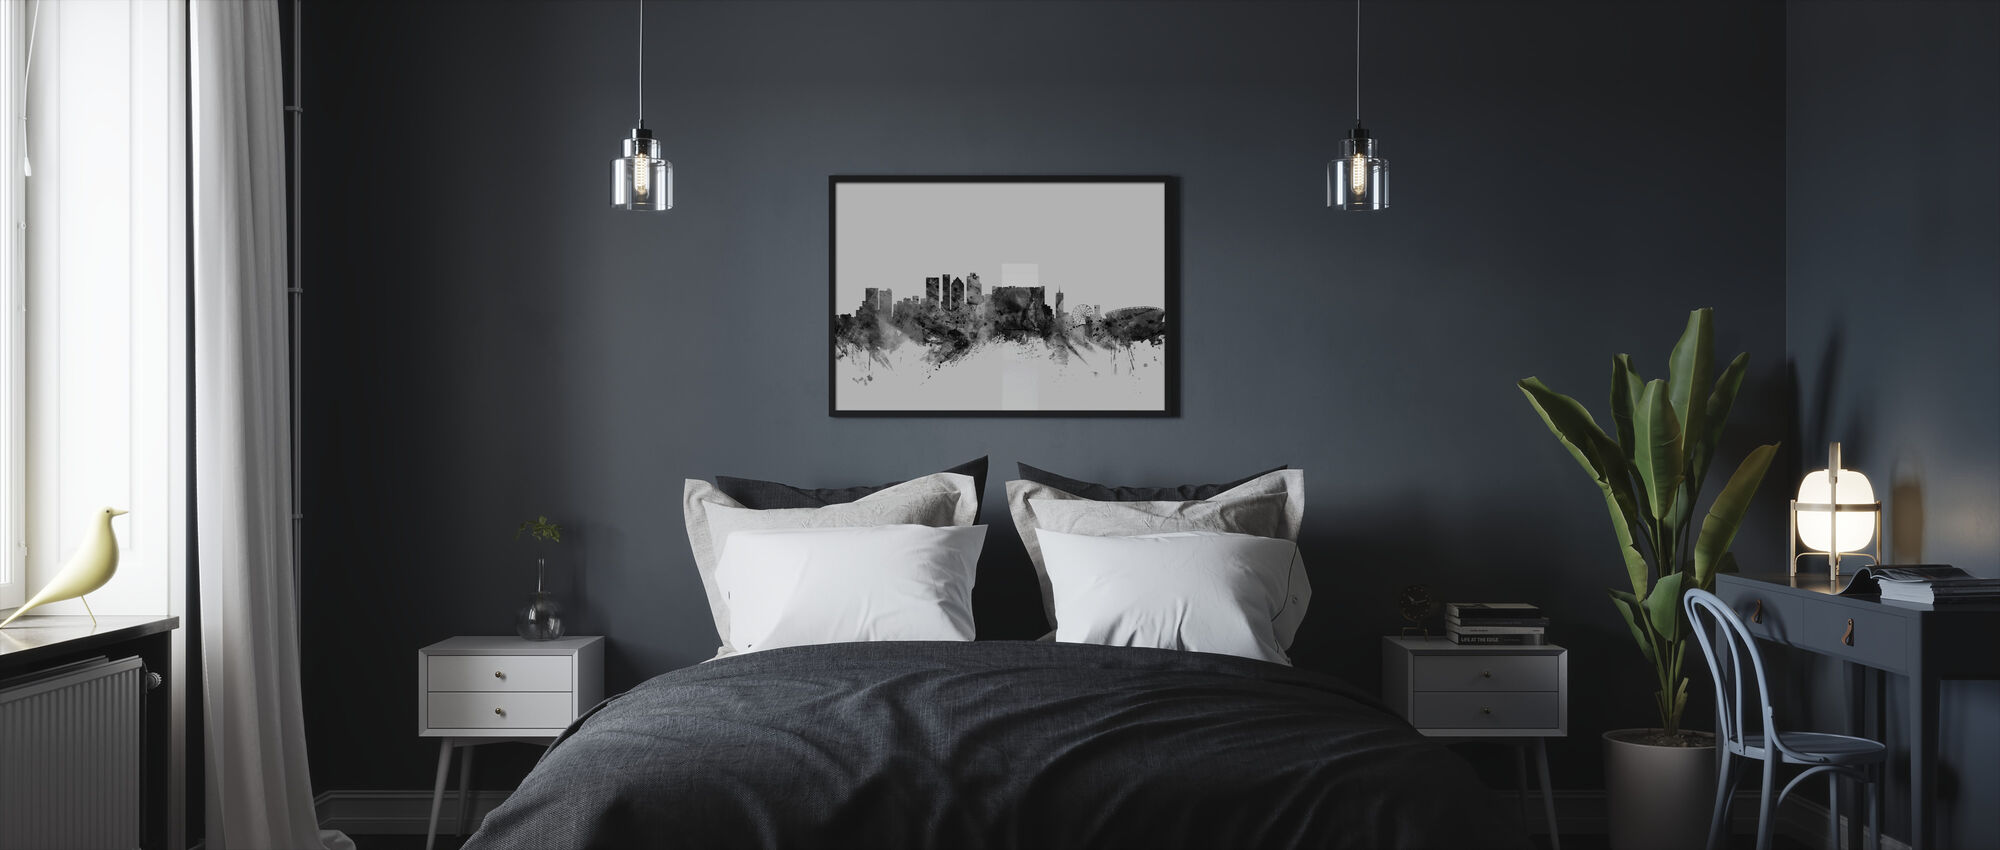 Cape Town South Africa Skyline Black - Framed print - Bedroom